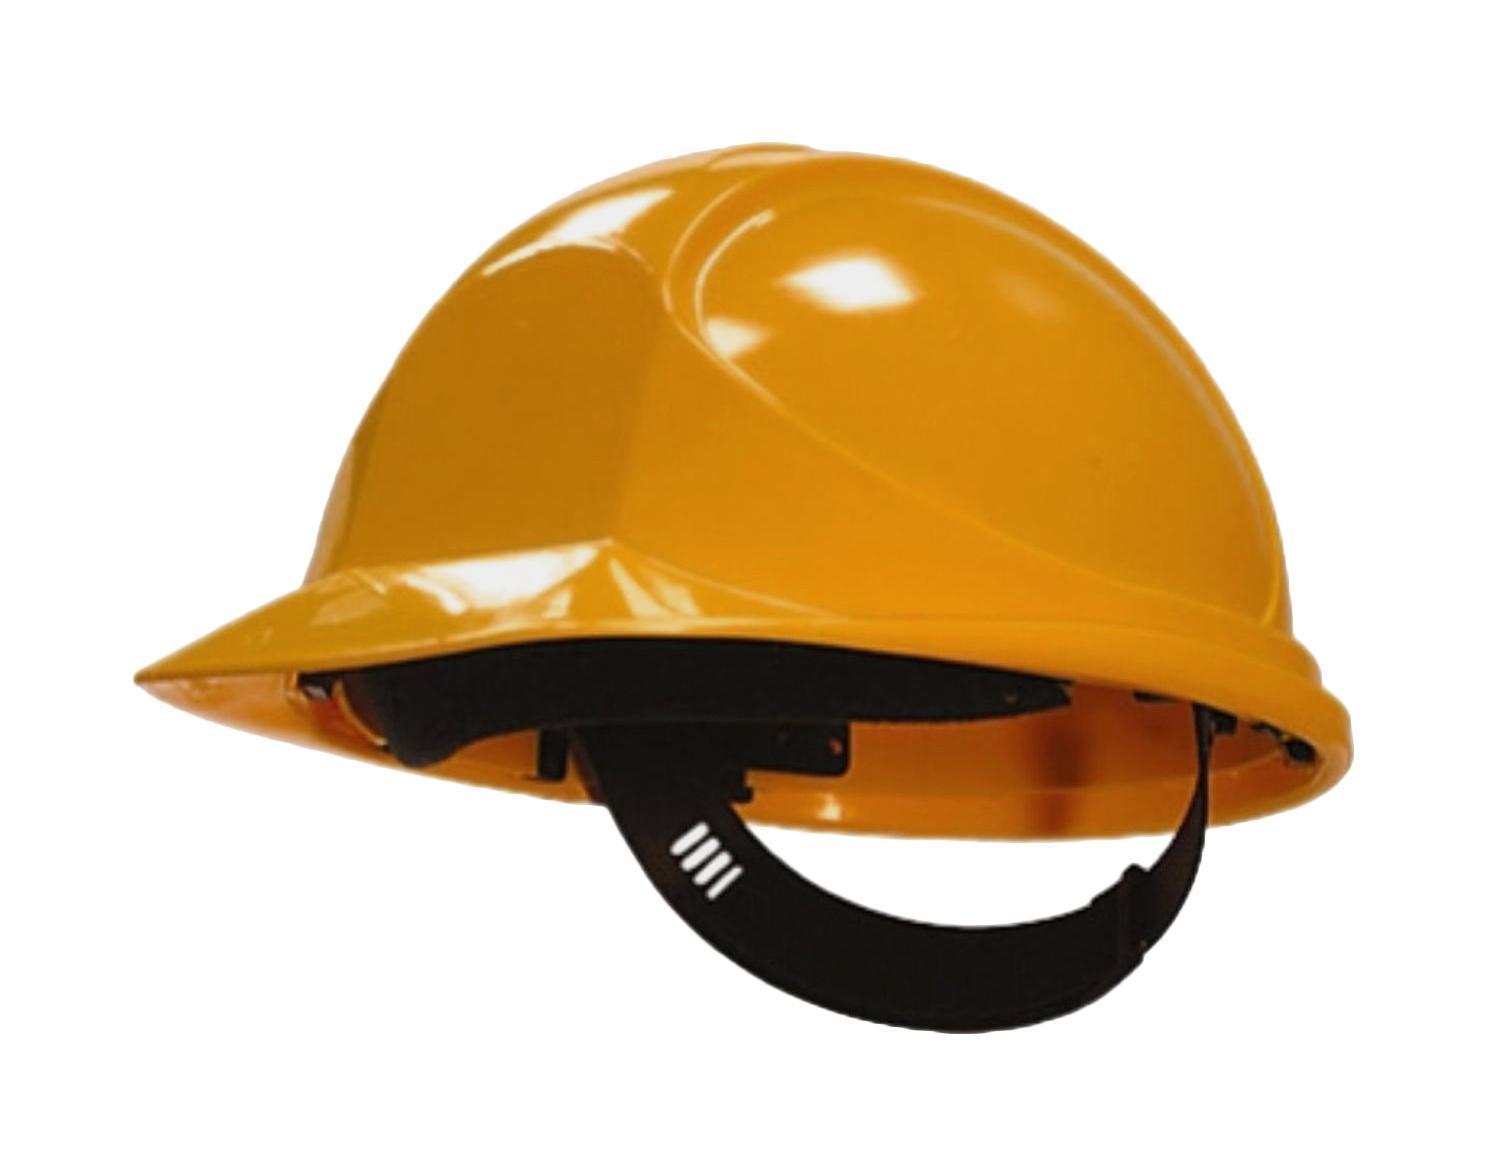 Каска AmparoКаски, шлемы<br>Материал: пластик,<br>Цвет: оранжевая,<br>Вес нетто: 0.46<br>